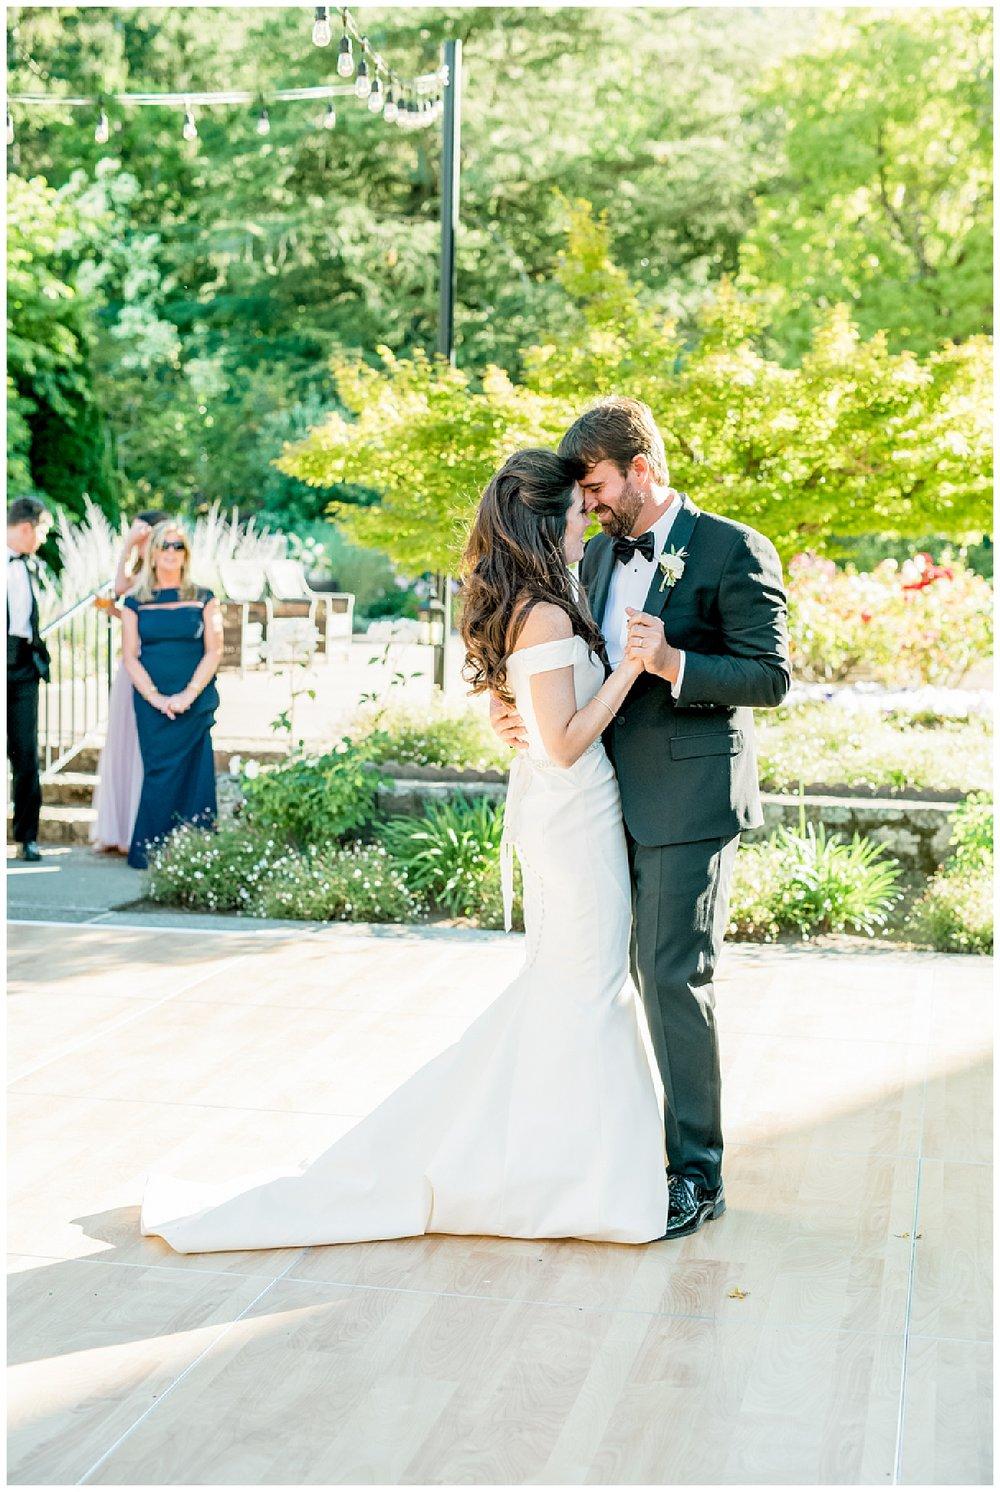 Janine_Licare_Photography_San_Francisco_Wedding_Photographer_0162.jpg